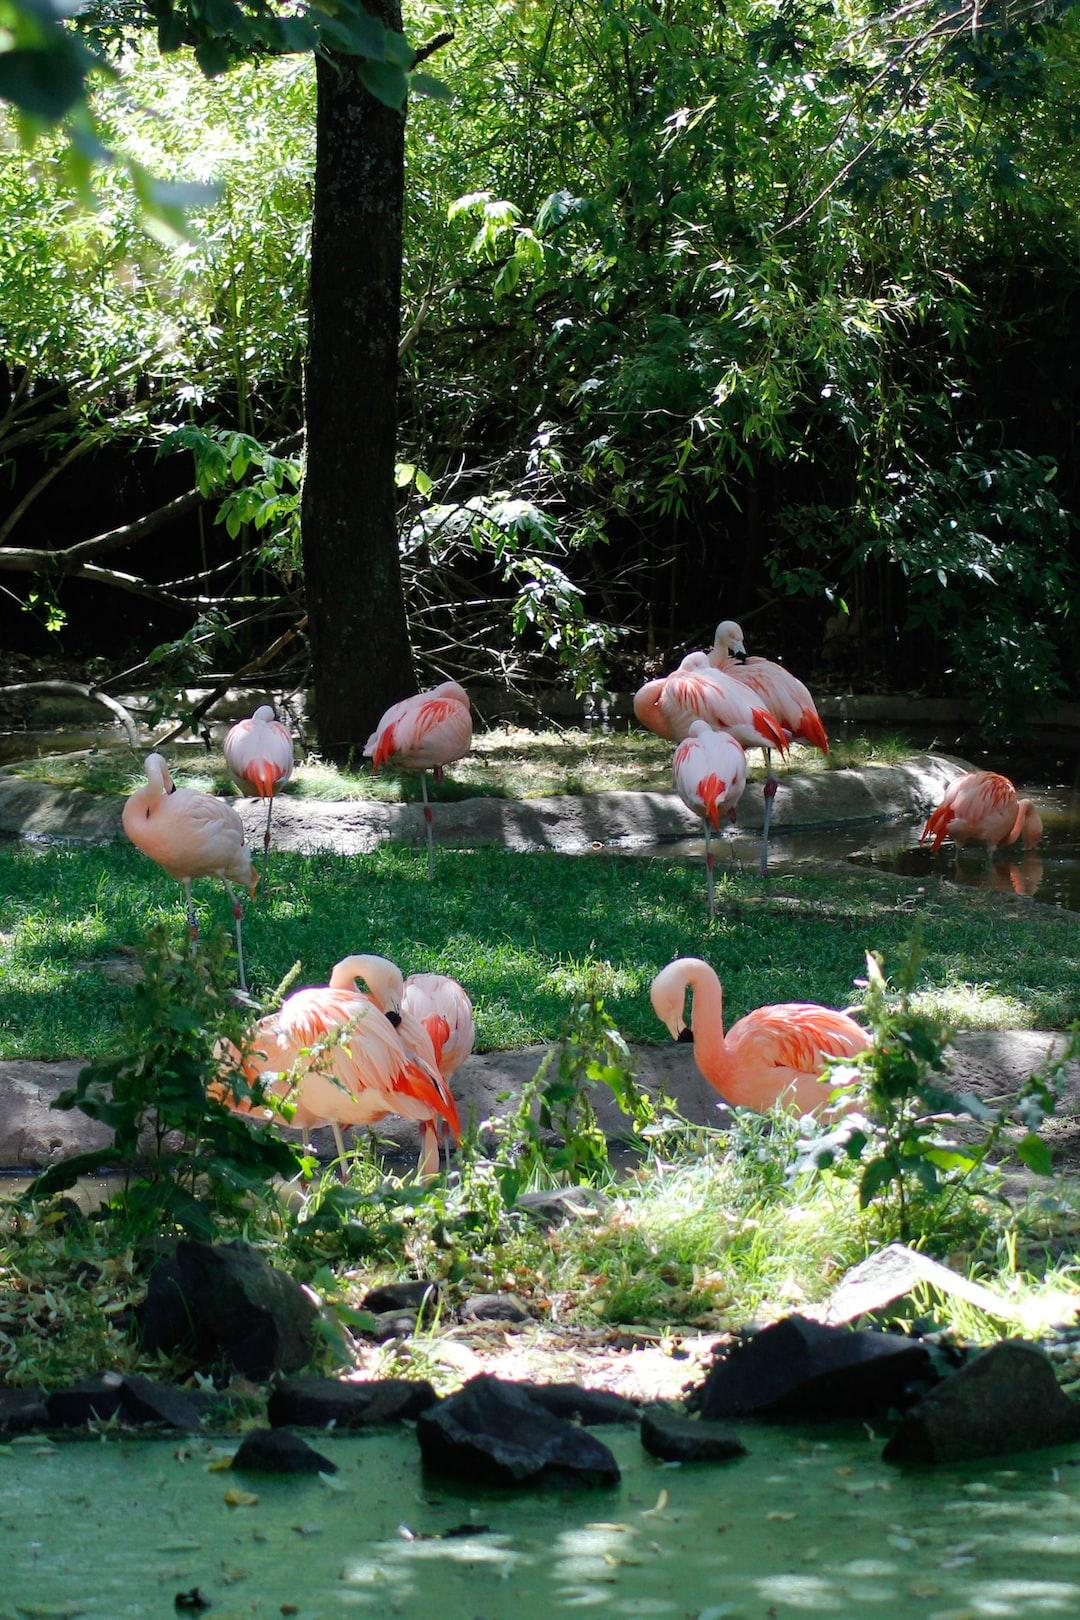 Greater Flamingo Island